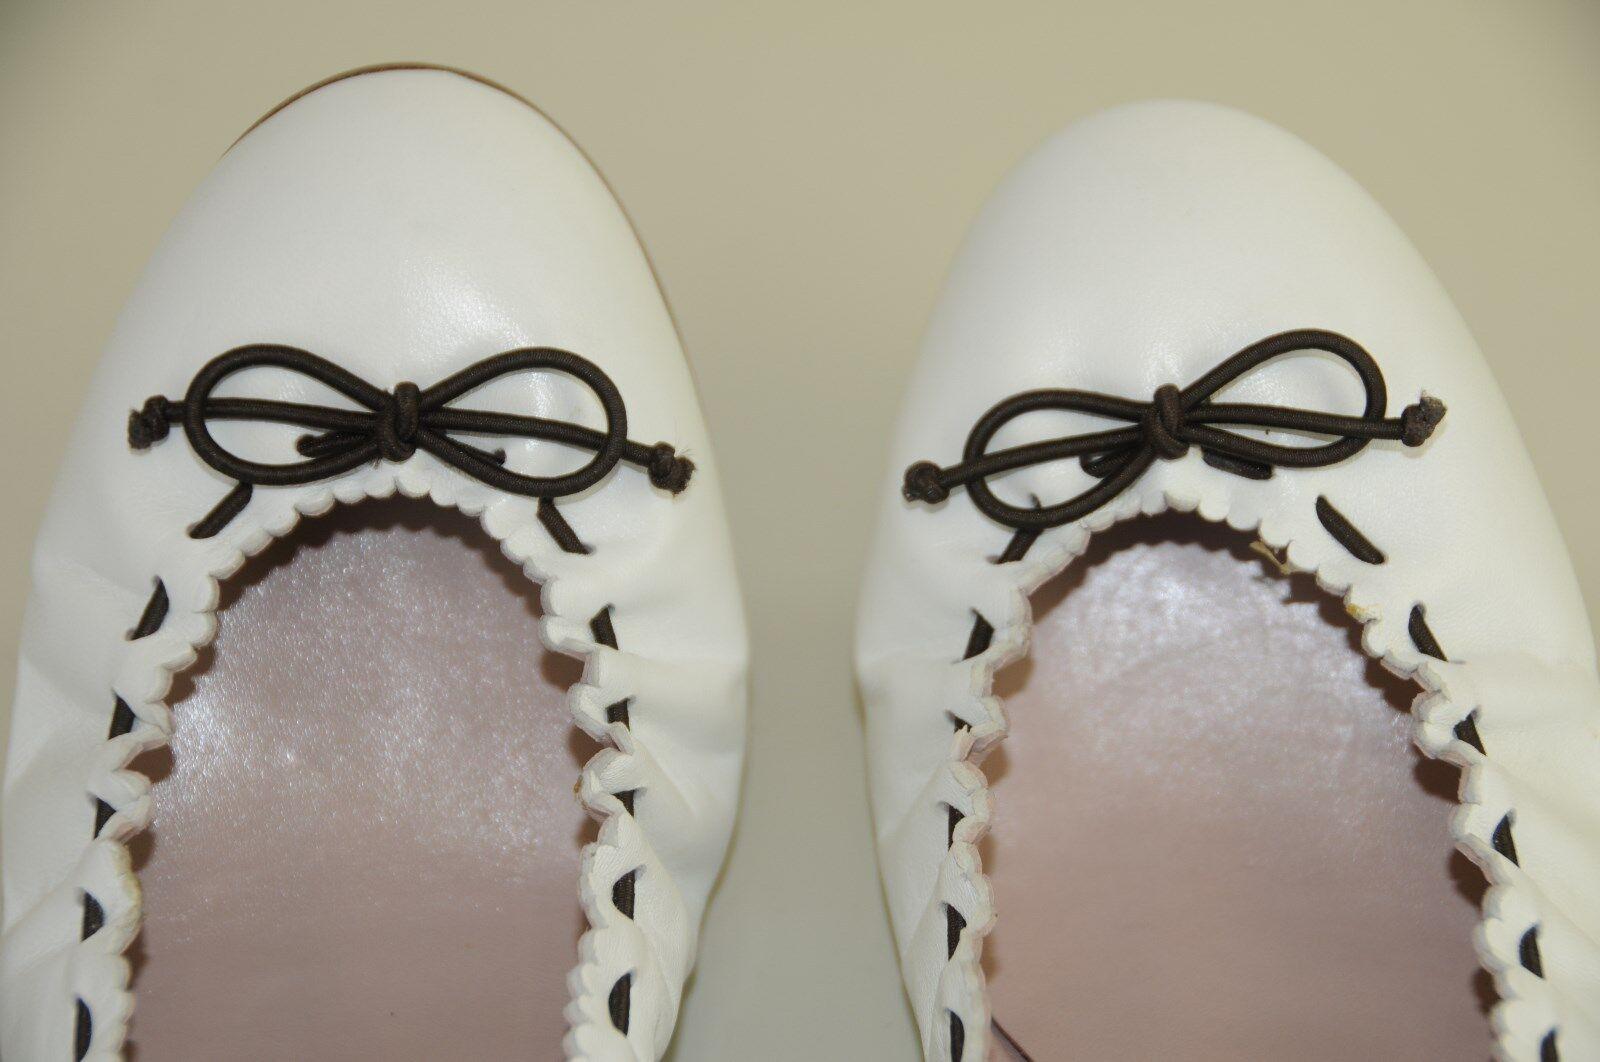 NEW MANOLO BLAHNIK TEFAMOD Brown White Bow Stretch Ballerina Flats SHOES 40.5